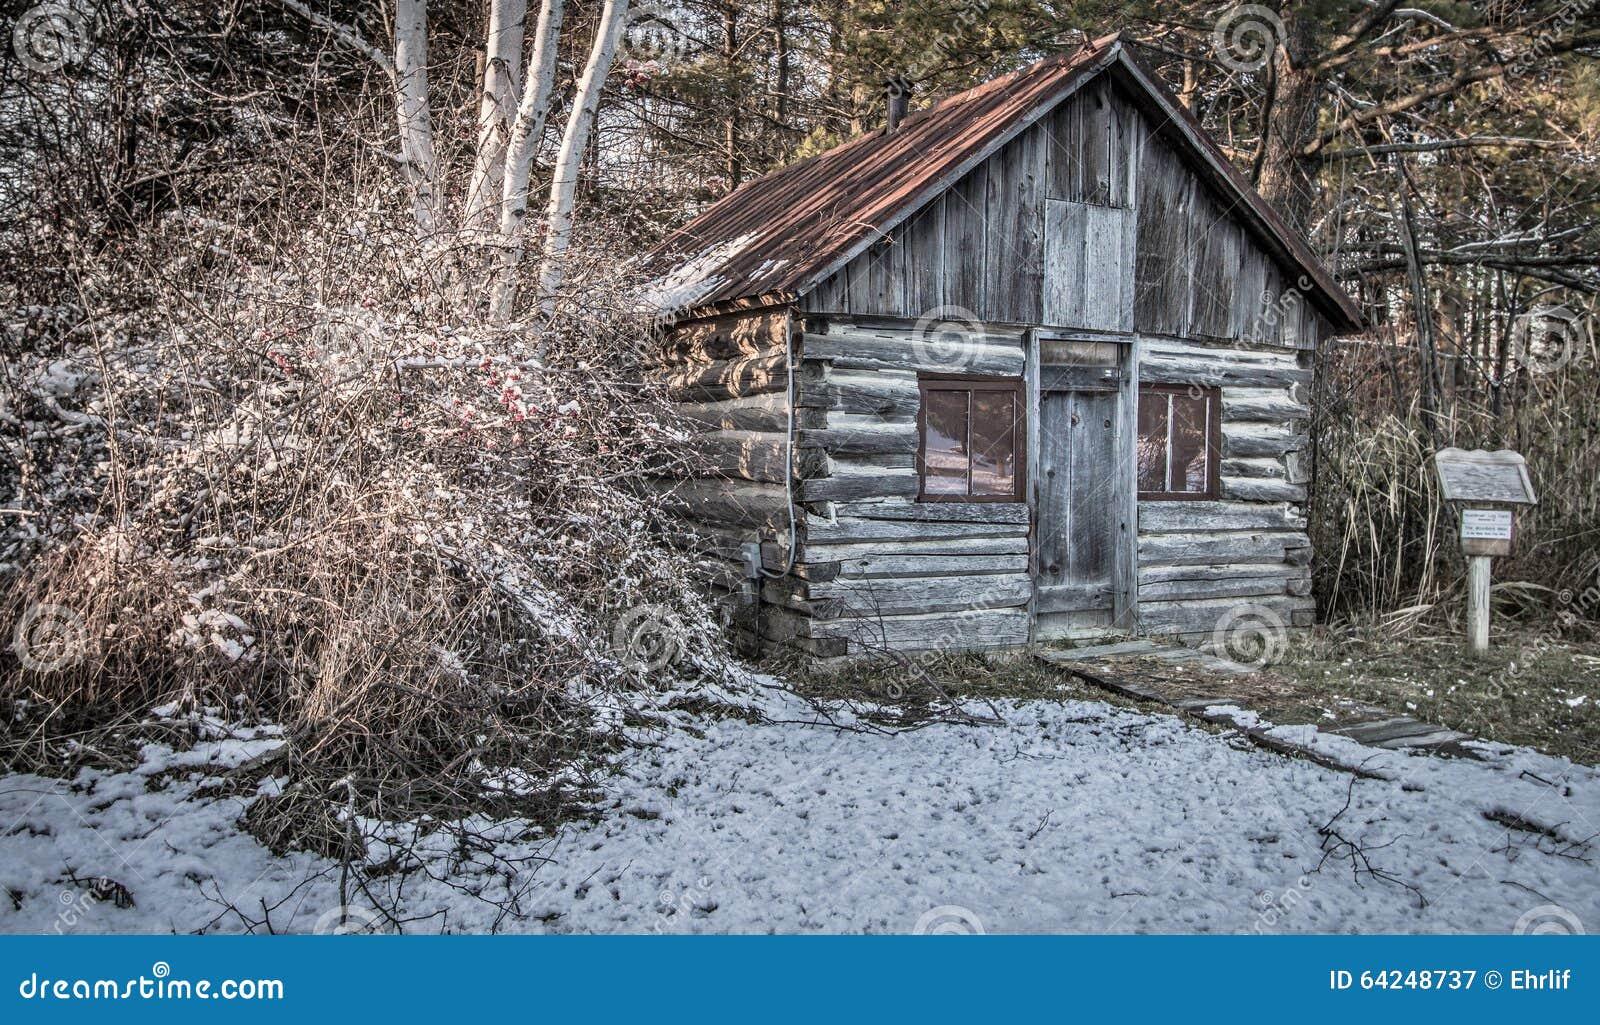 historical pioneer log cabin stock image image of cozy american 64248737. Black Bedroom Furniture Sets. Home Design Ideas